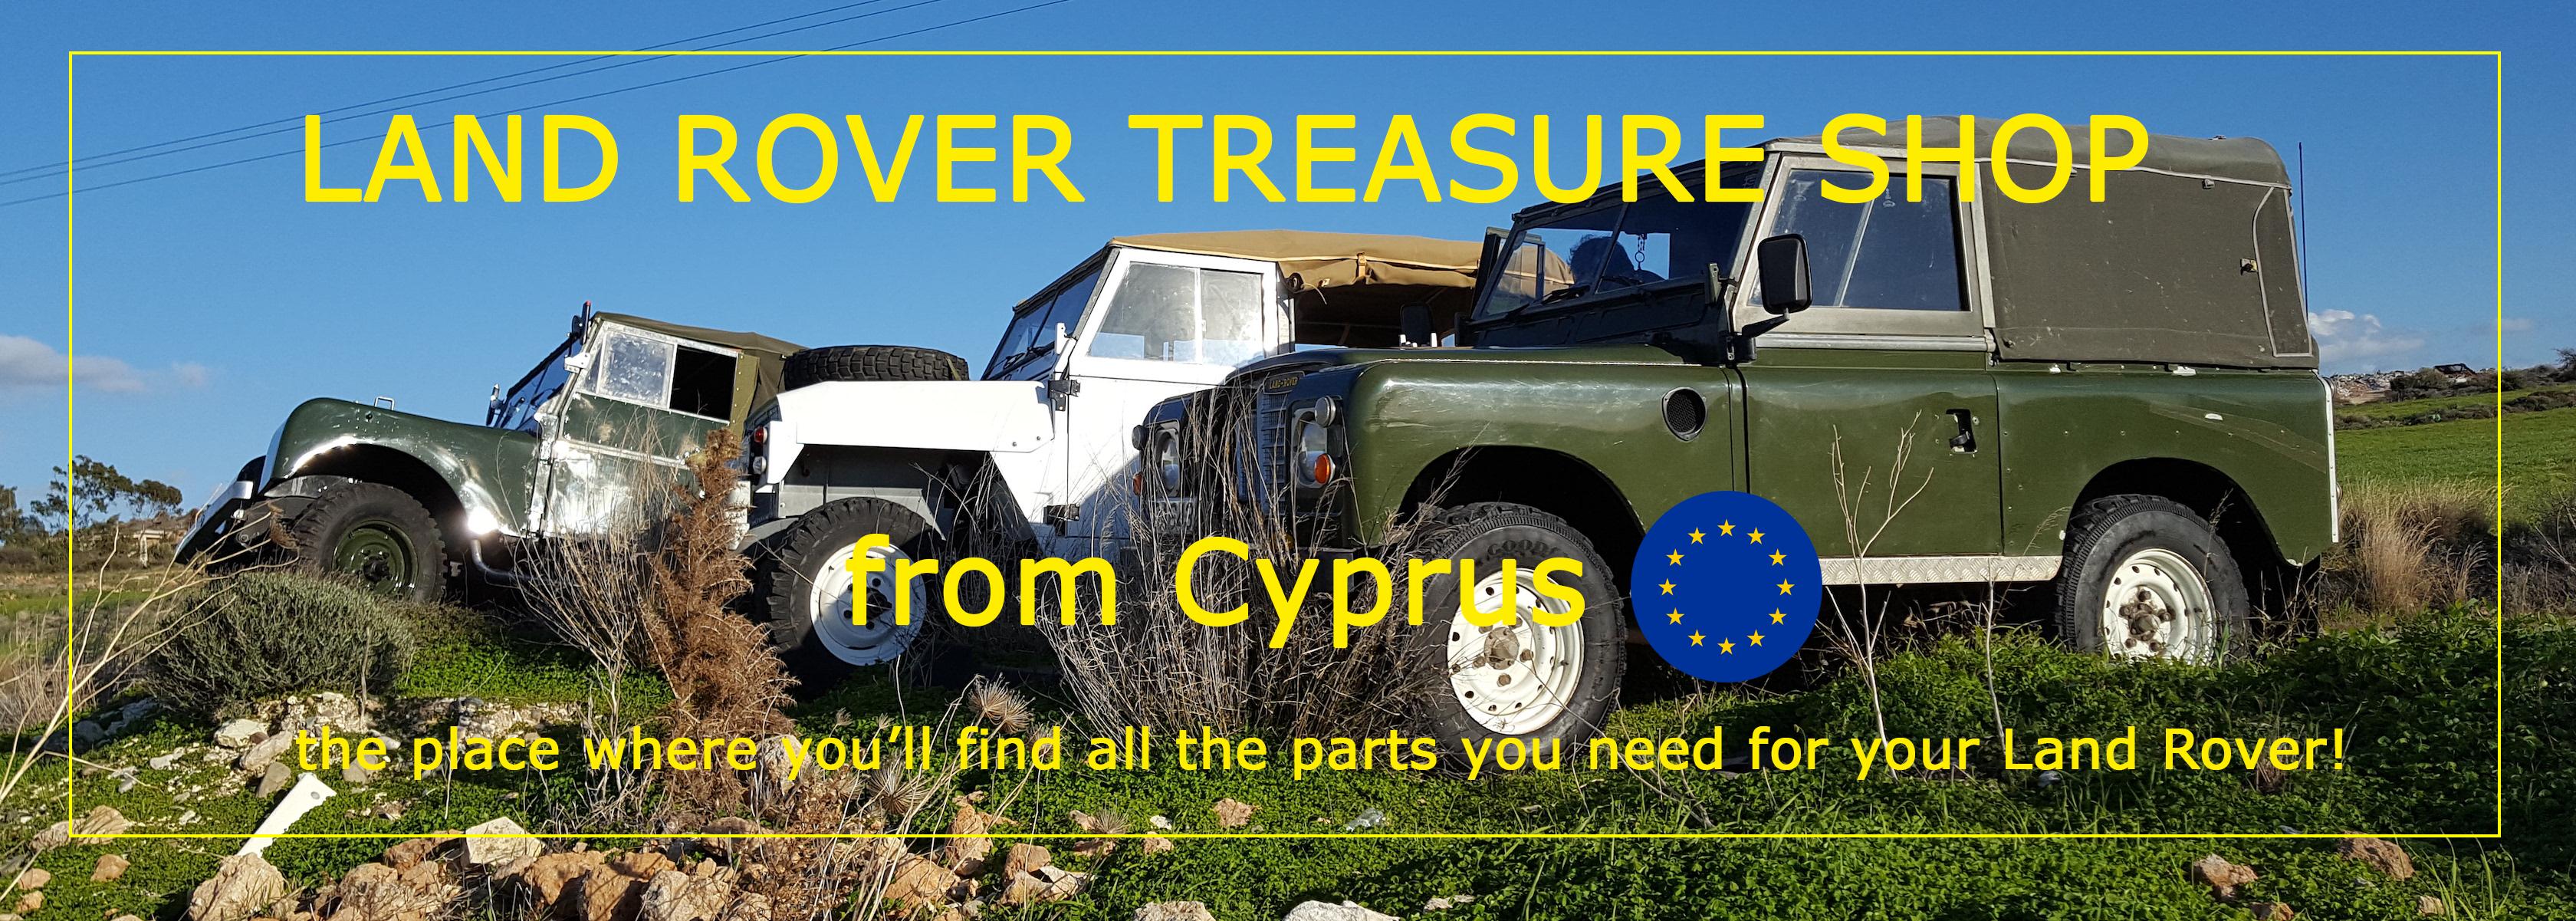 Land Rover Treasure Shop from Cyprus EU